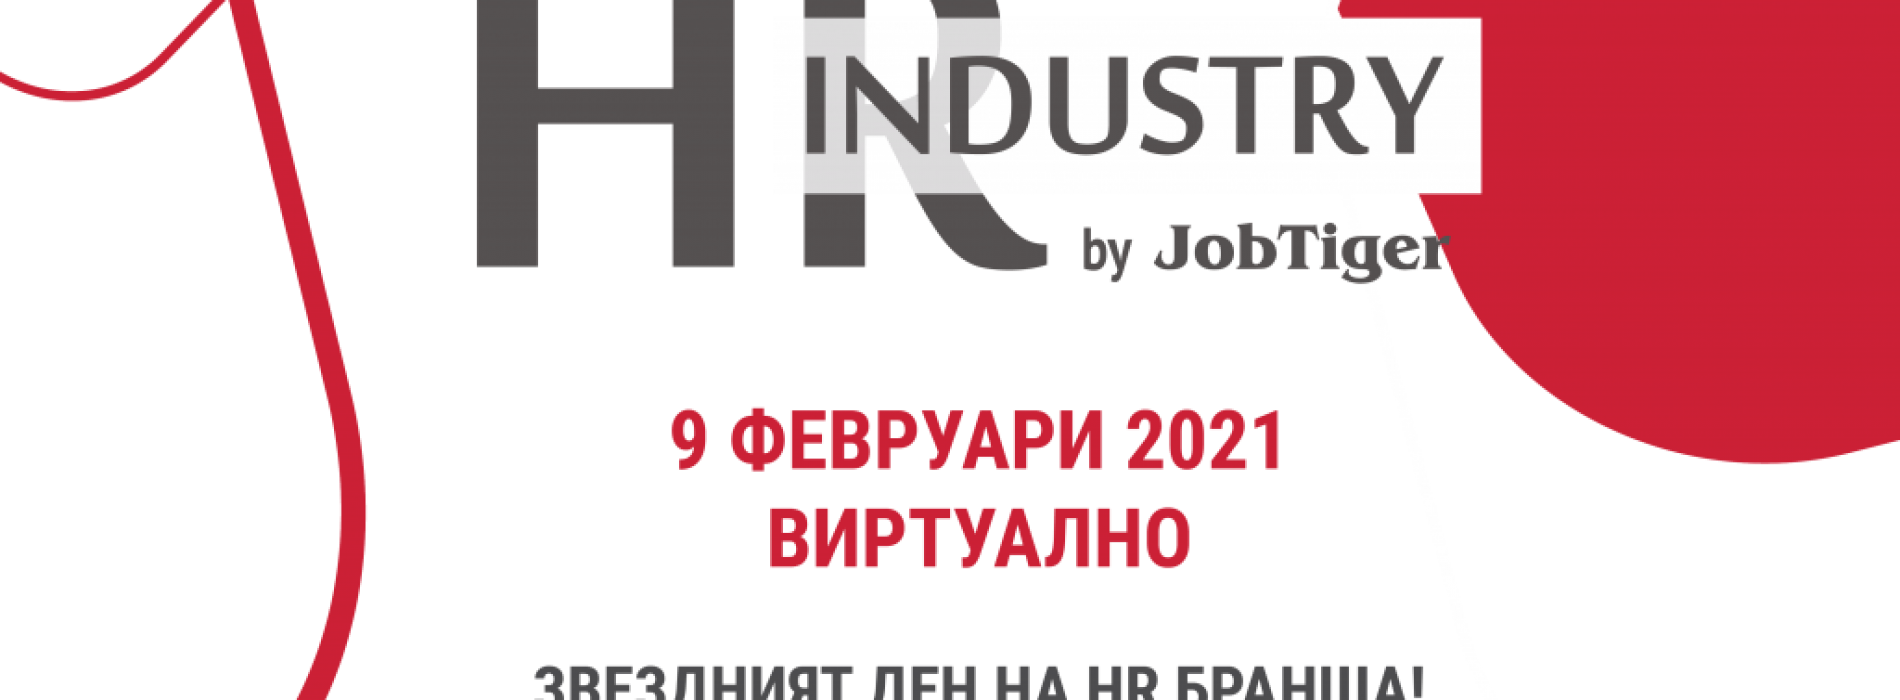 MetLife – генерален спонсор на HR Industry 2021